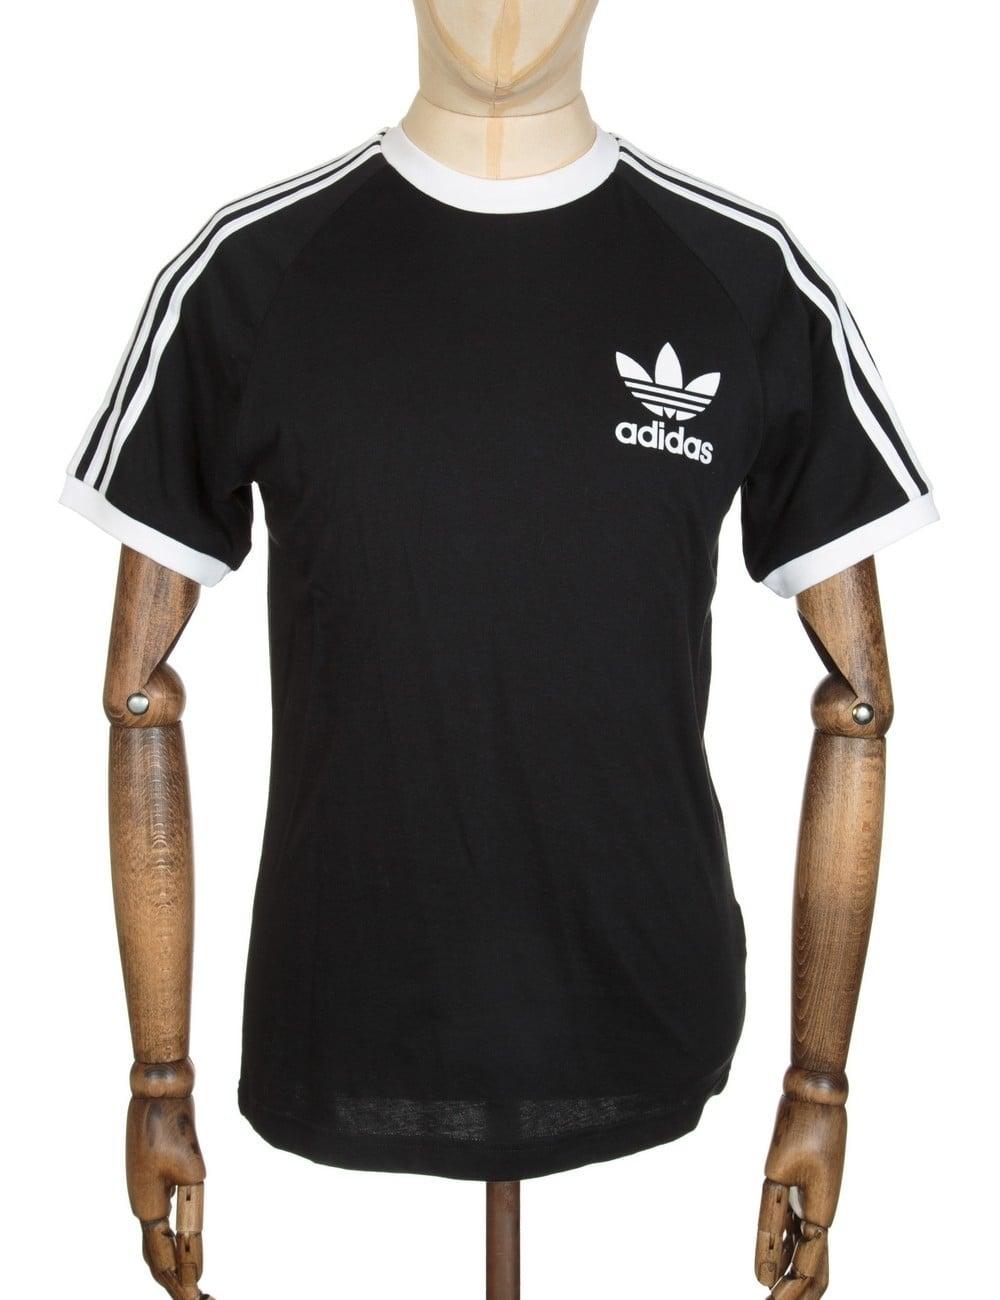 0a3733fd4a9bd3 Adidas Originals California Flock Tee - Black White - Clothing from ...